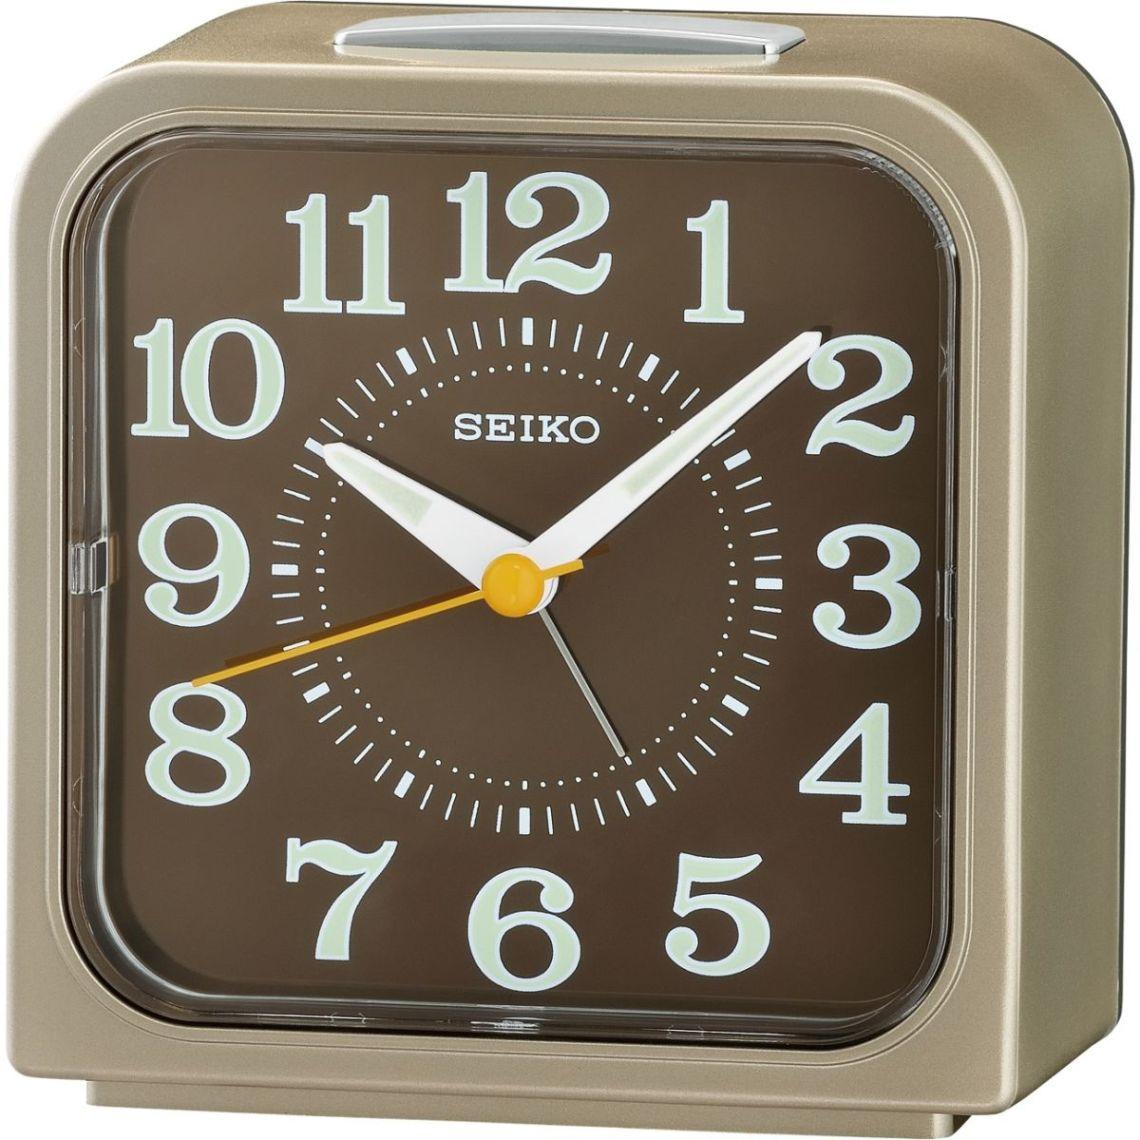 Great Alarm Bedside - qhk048s-1504871168-5198  Photograph_614077.jpg